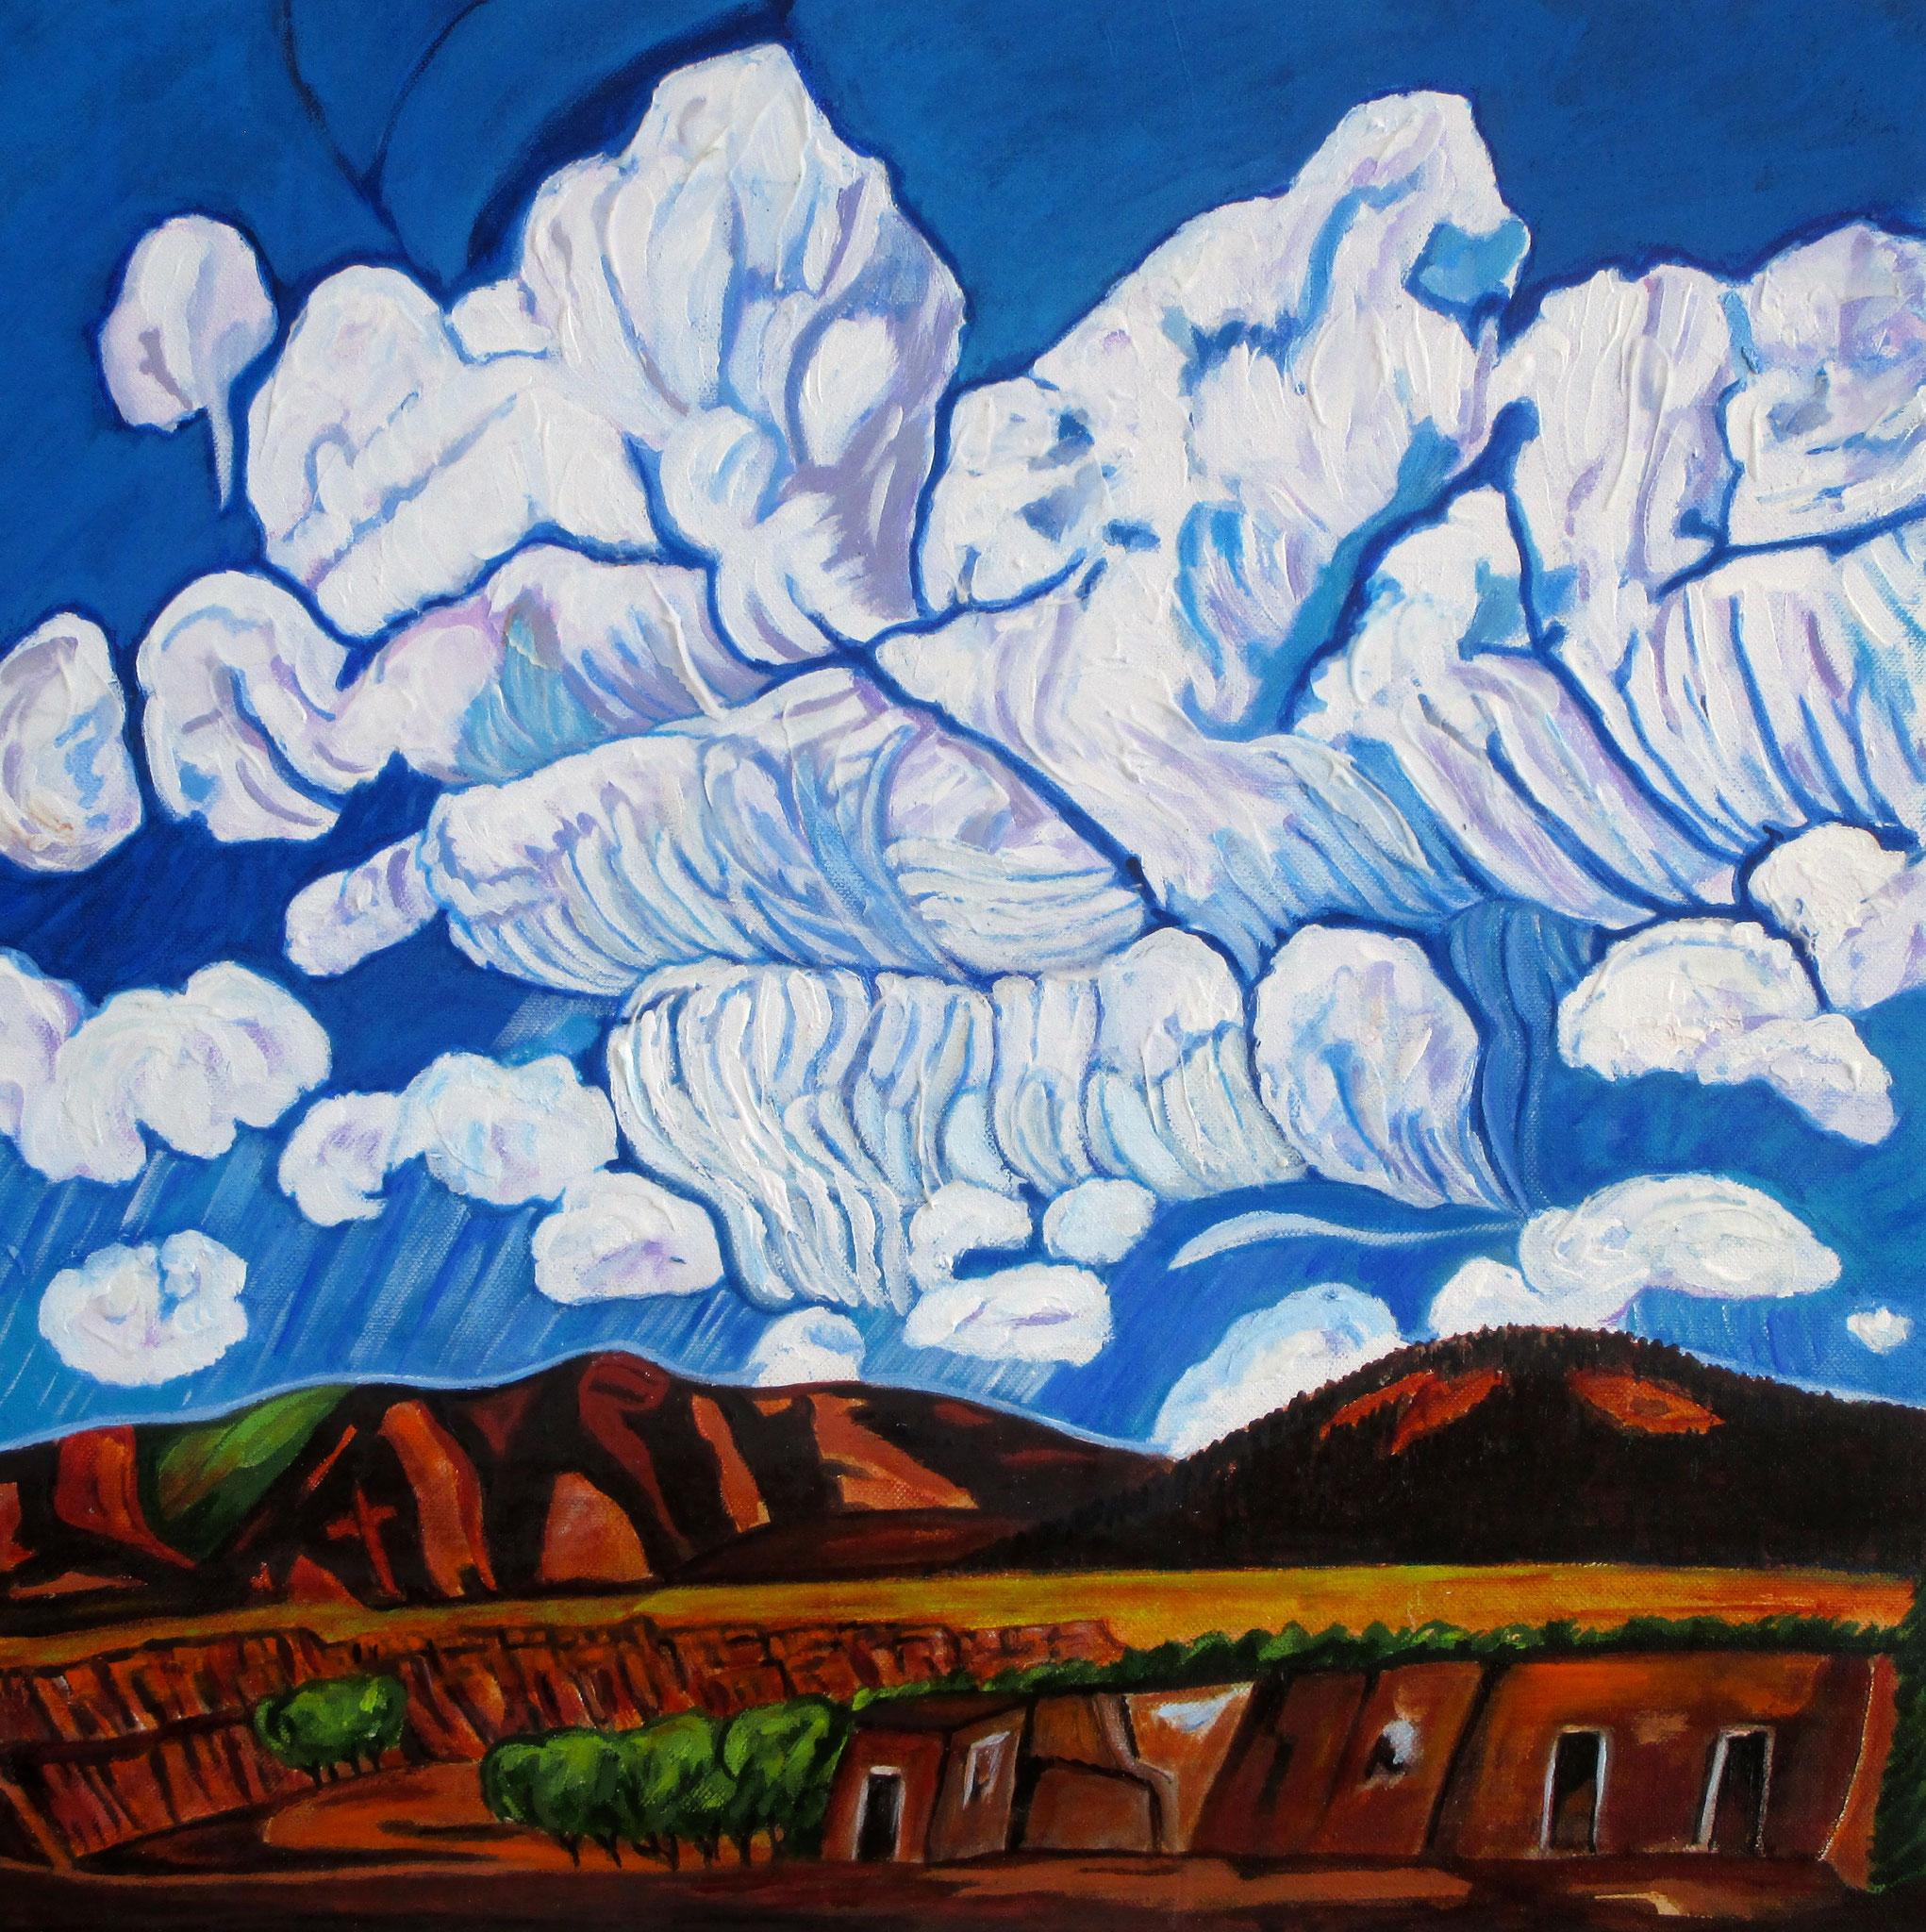 Cloud Dance, acrylic on canvas, 20 x 20, SOLD